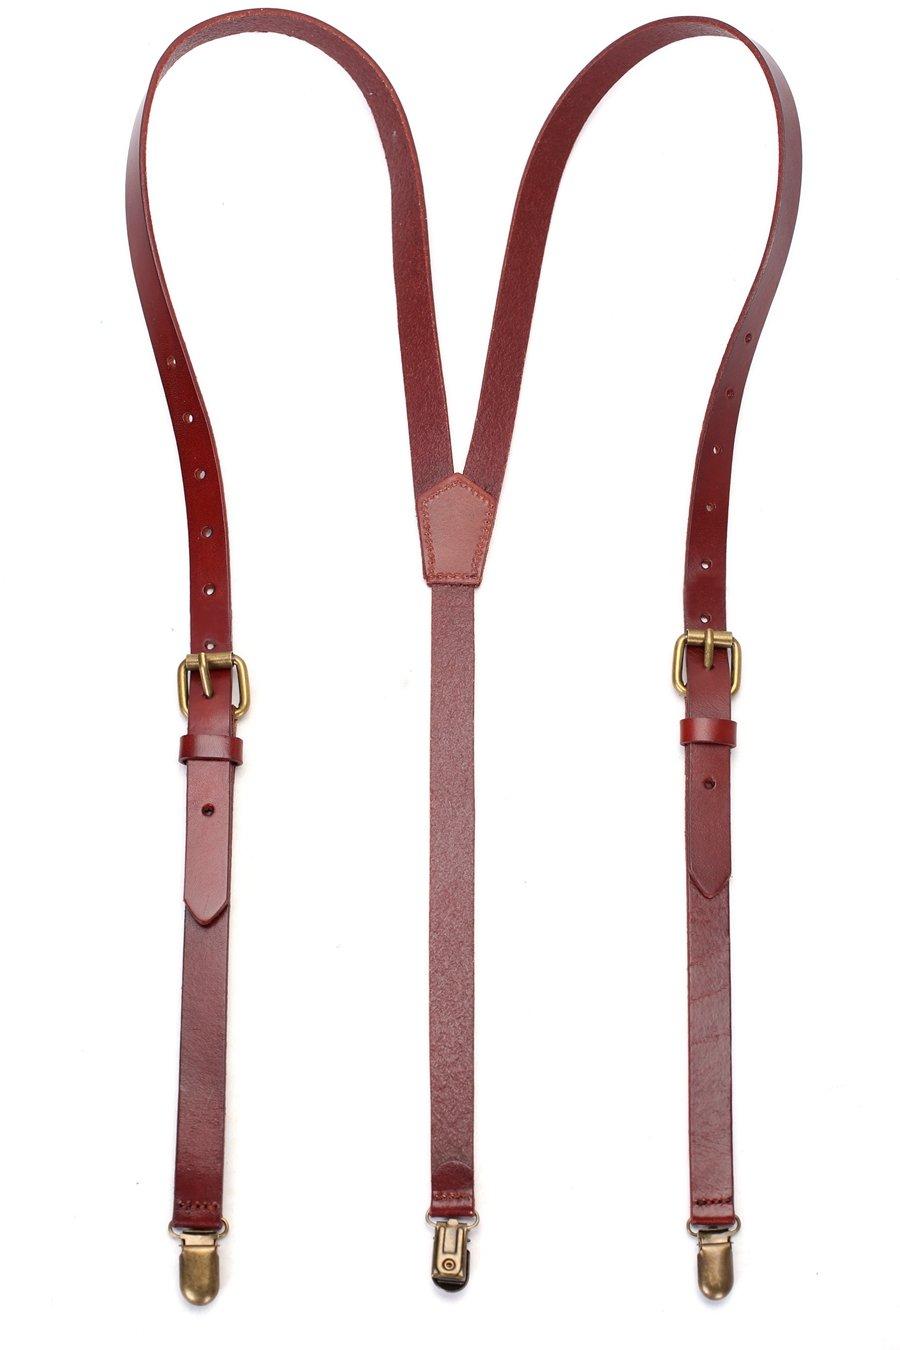 ROCKCOW Leather Suspenders Wedding Suspenders 100% Handcrafted - Sevilla Standard Brown Vintage